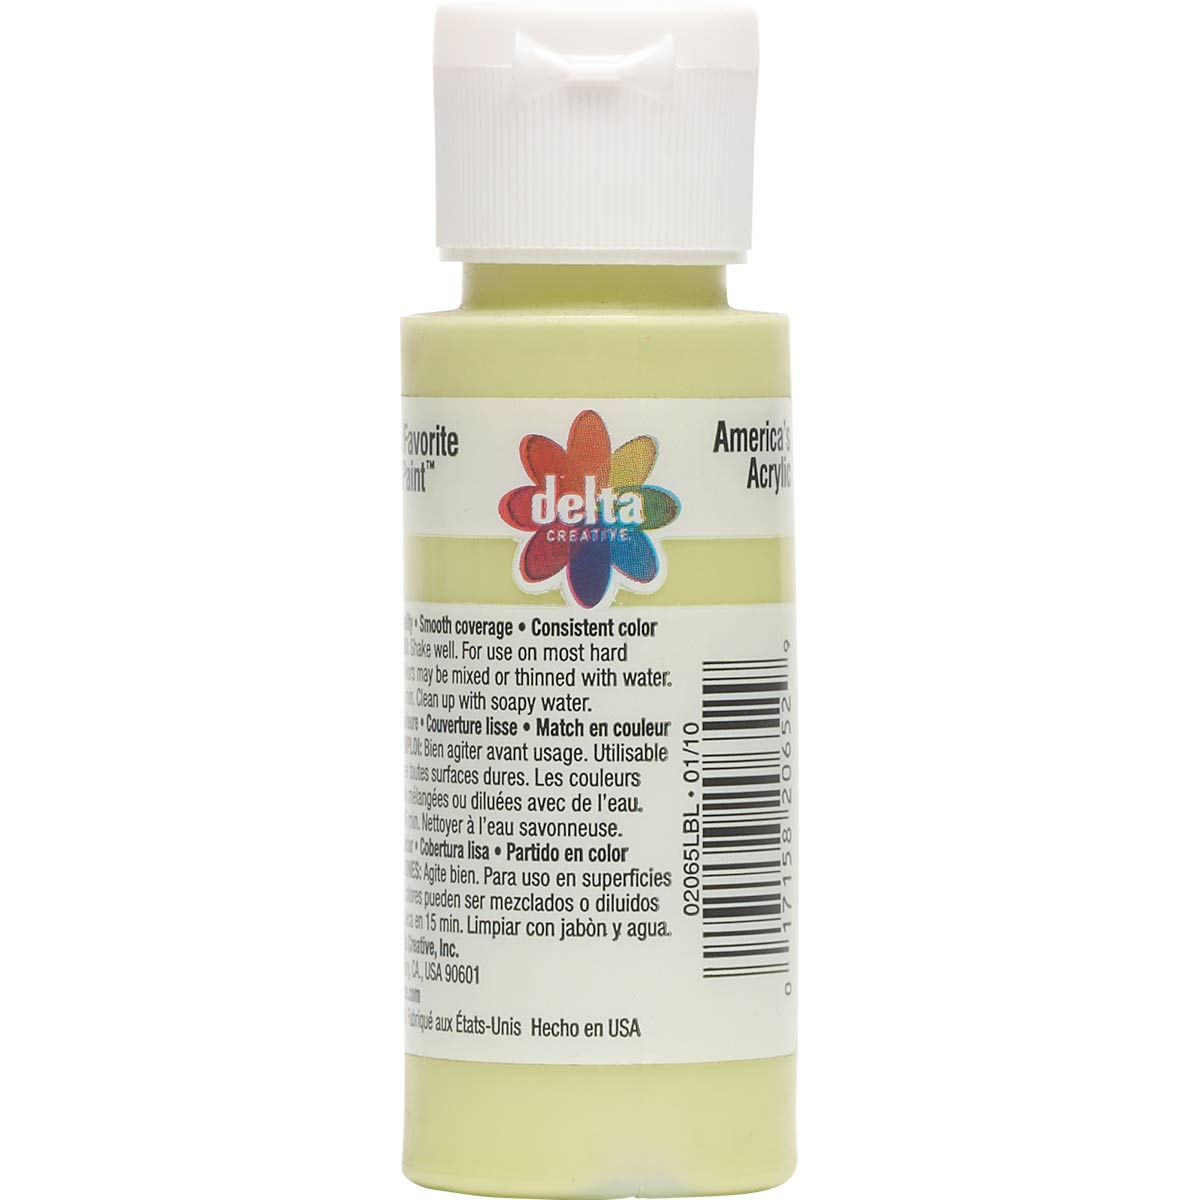 Delta Ceramcoat ® Acrylic Paint - Apple Green, 2 oz. - 020650202W